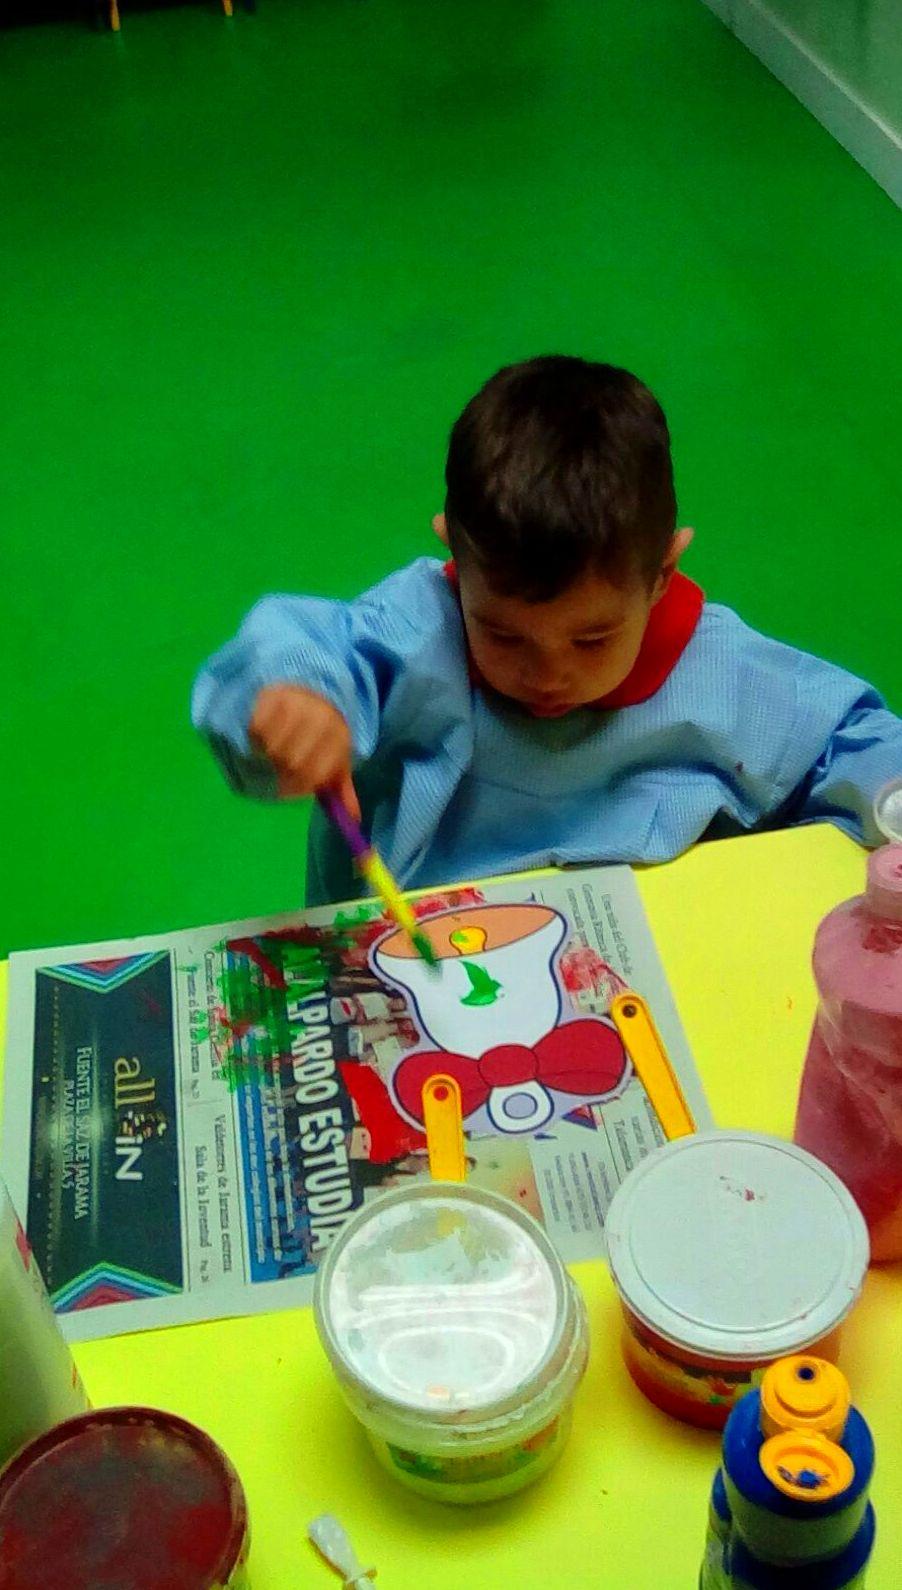 Foto 25 de Escuela infantil en Algete | E.I. Cuatro Pecas de Colores